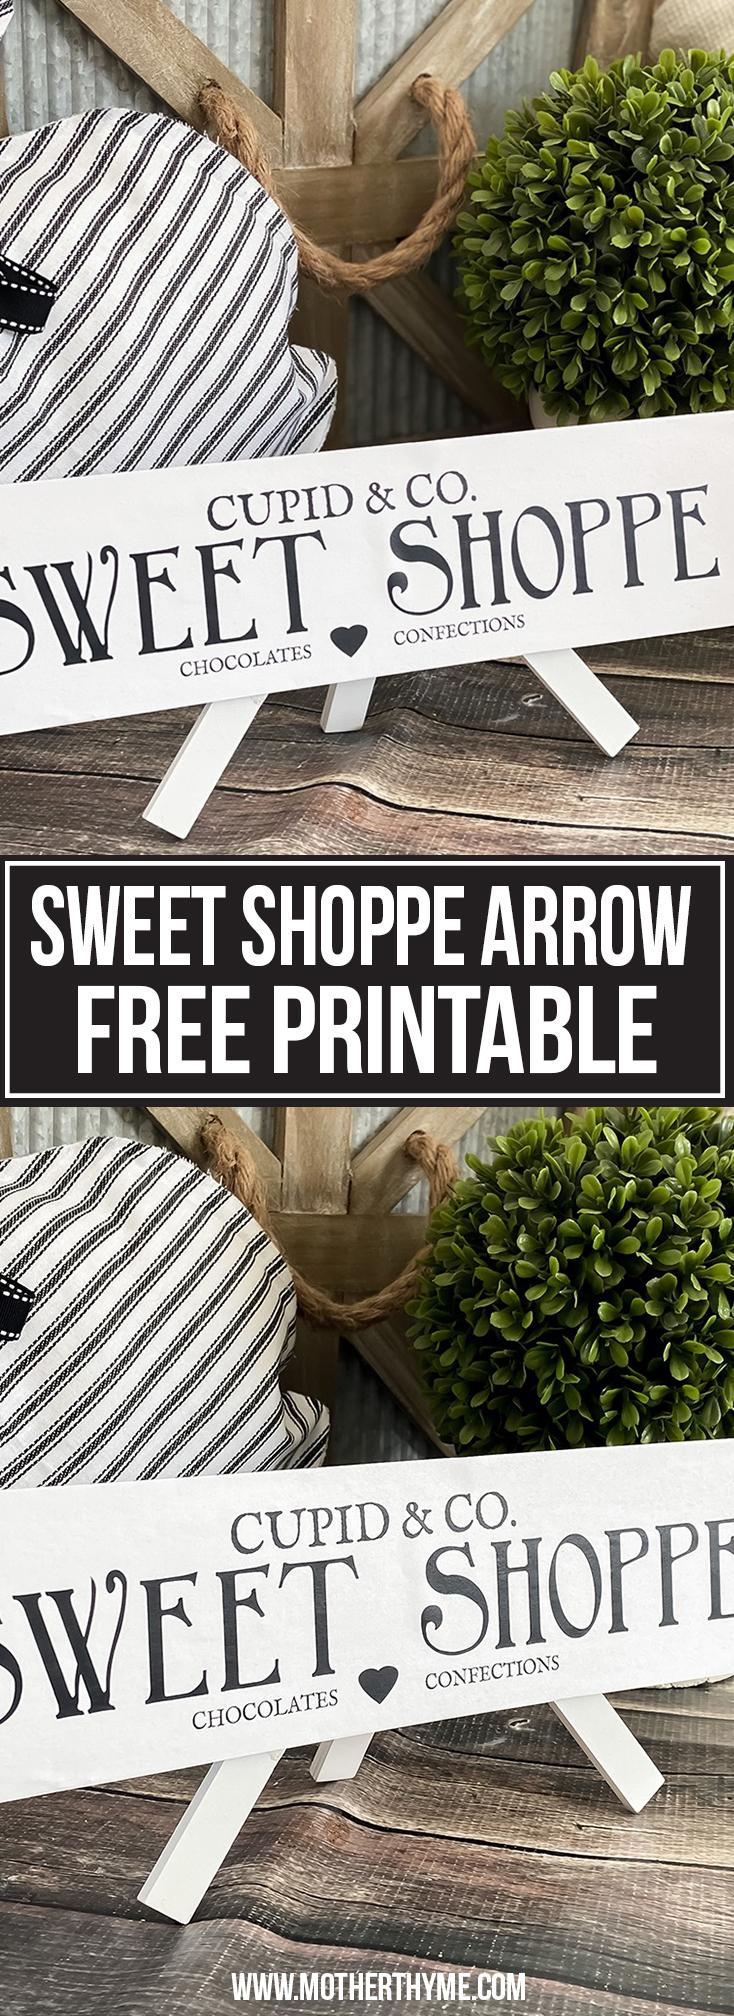 CUPID & CO. SWEET SHOPPE ARROW - FREE PRINTABLE